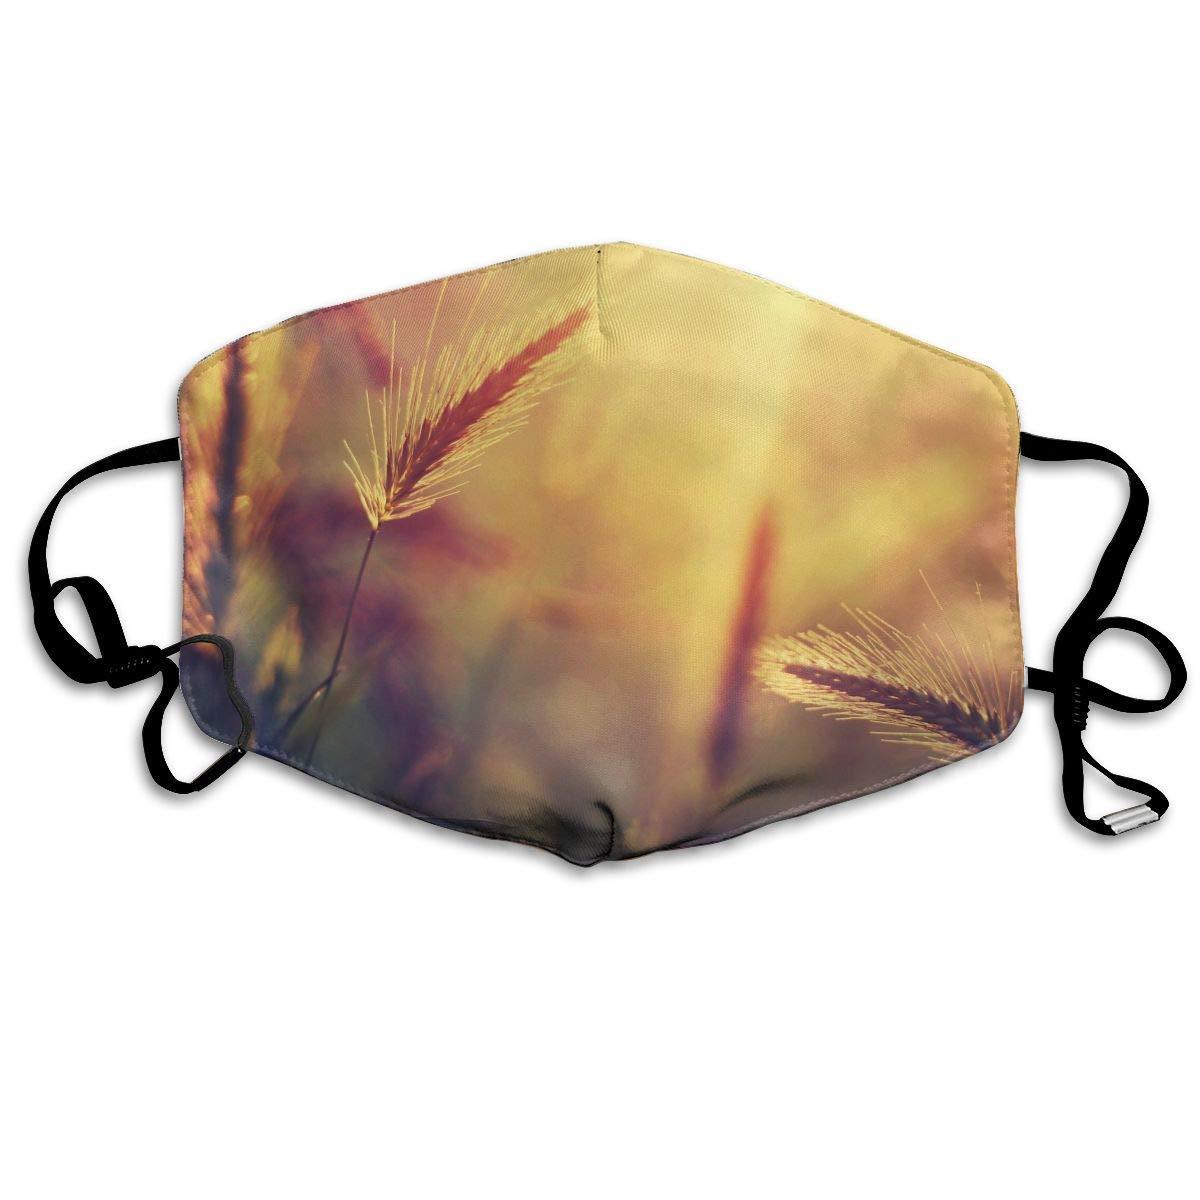 Daawqee Máscara de Boca, Summer Wheat Sunset Adult Fashion Mascarilla Washable Safety 100% Polyester Comfortable Breathable Health Half Face Masks